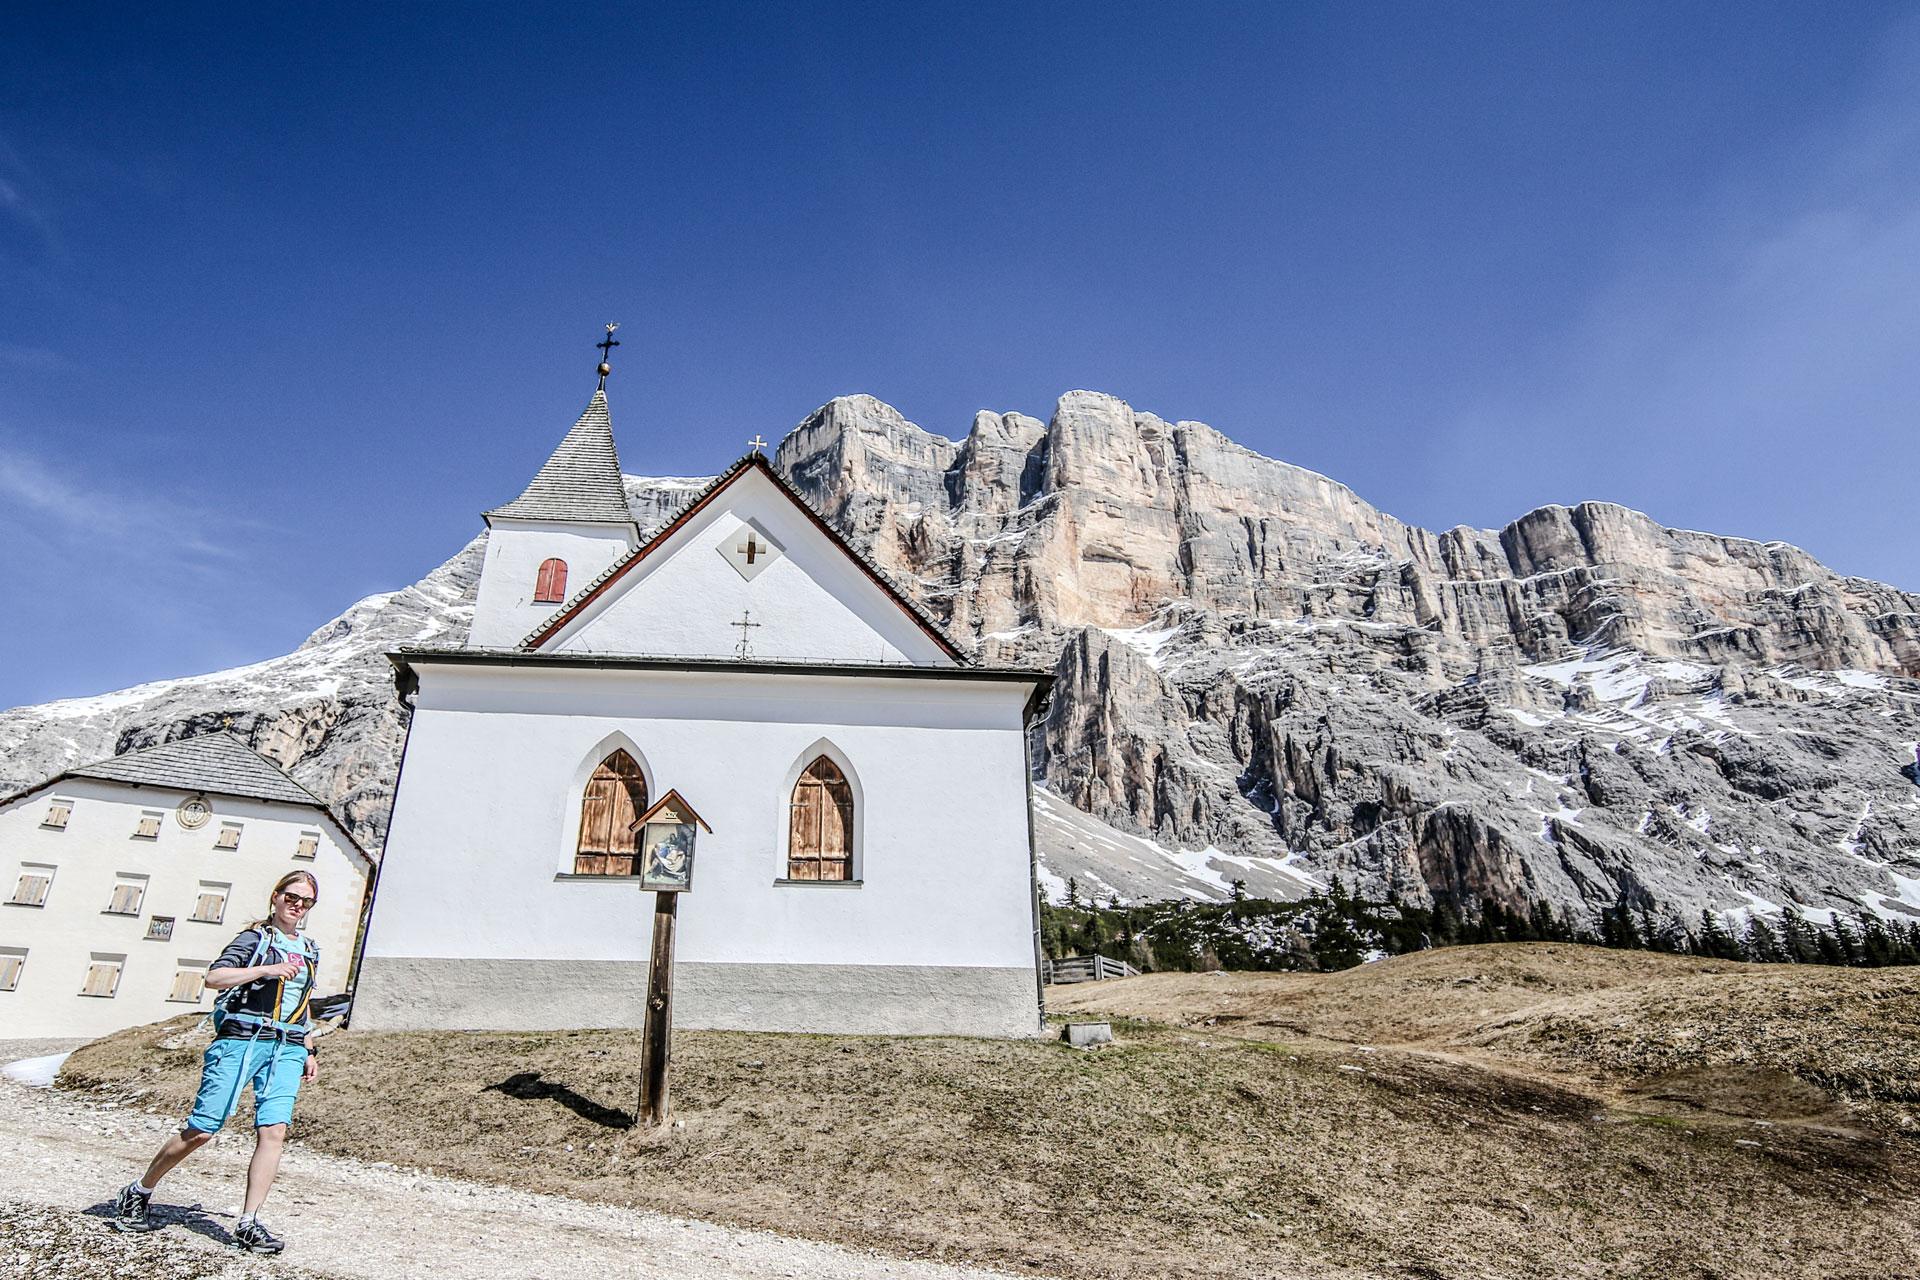 /wp-content/uploads/itineraries/Dolomites/stores-hiking-2.jpg